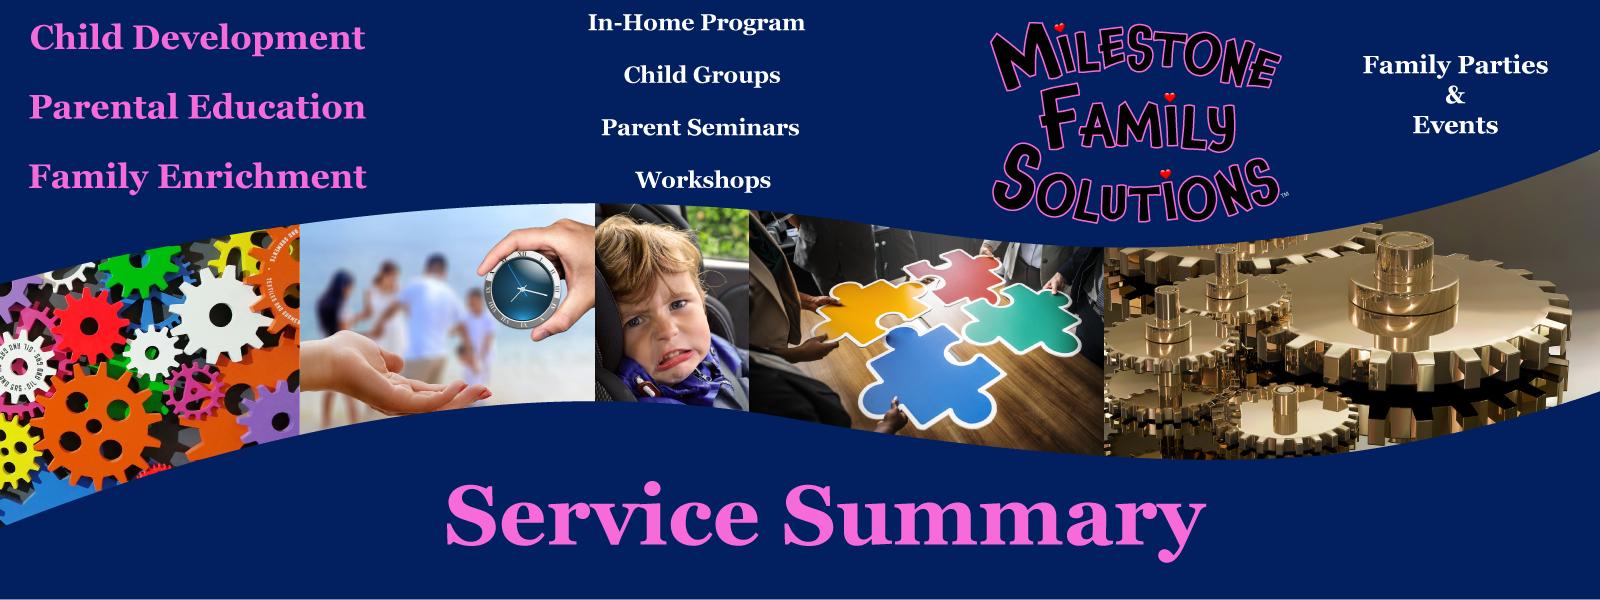 service summary header